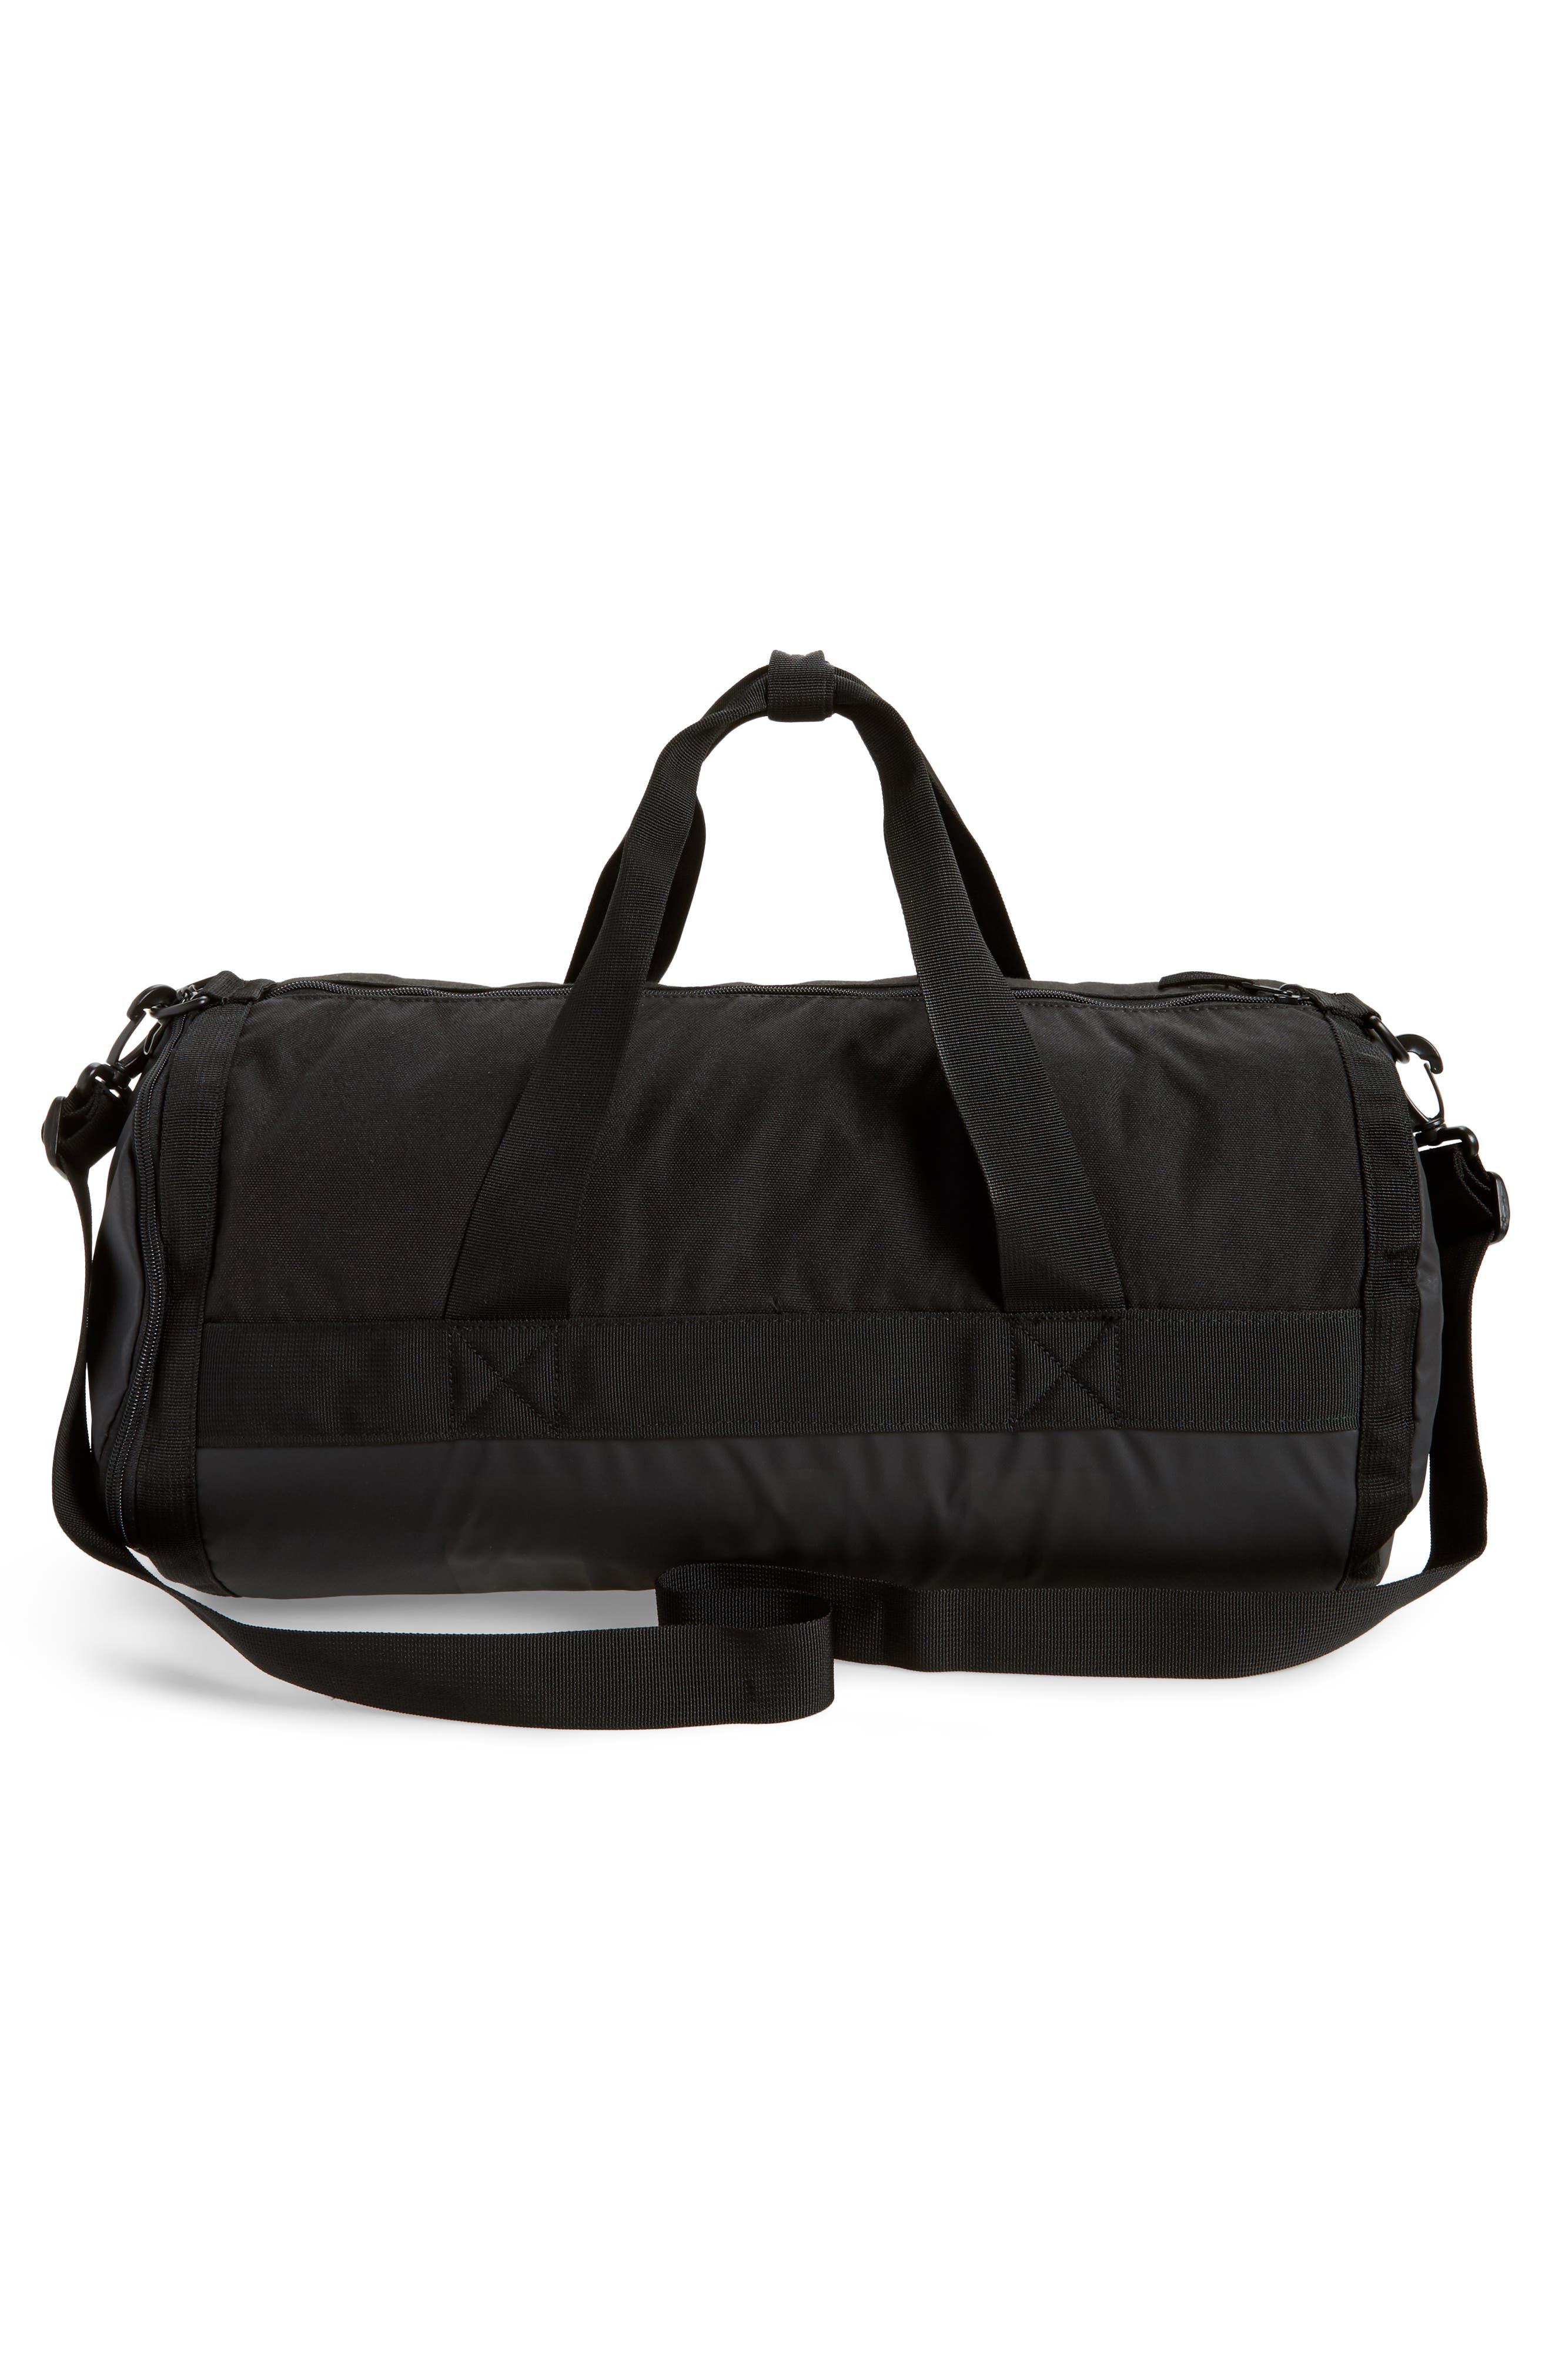 Originals Court Duffel Bag,                             Alternate thumbnail 3, color,                             Black